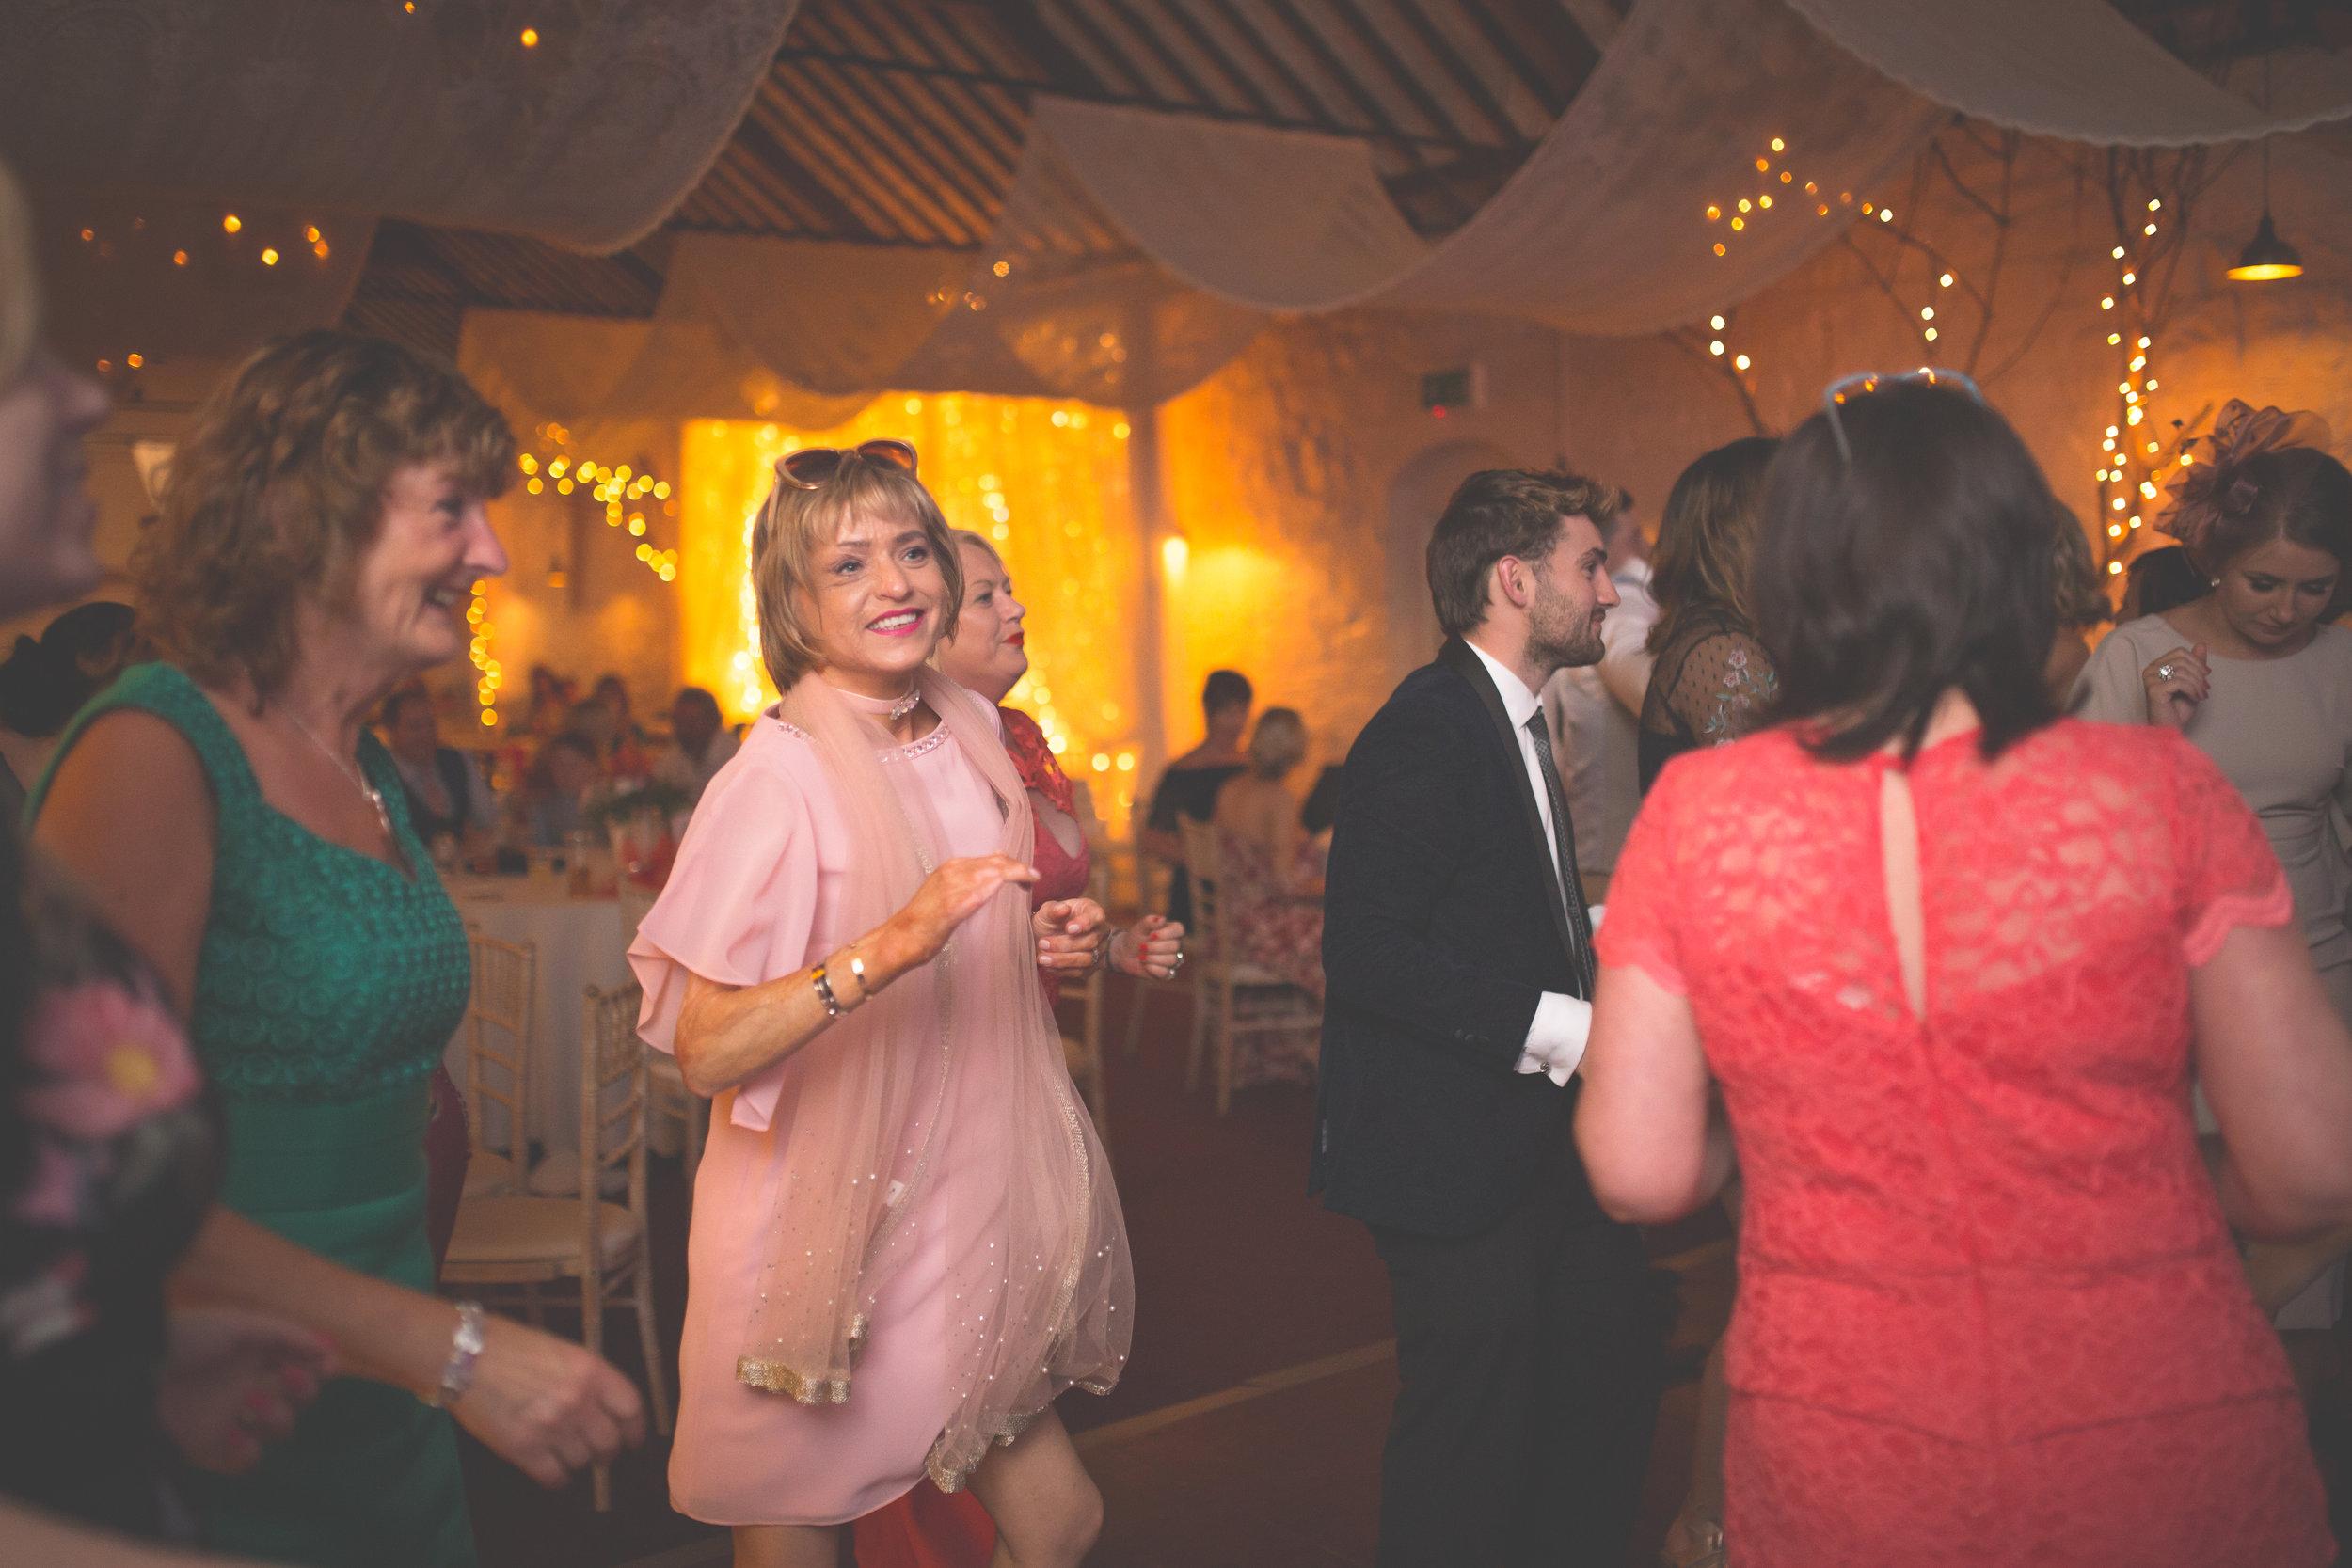 Brian McEwan Wedding Photography | Carol-Annee & Sean | The Dancing-96.jpg